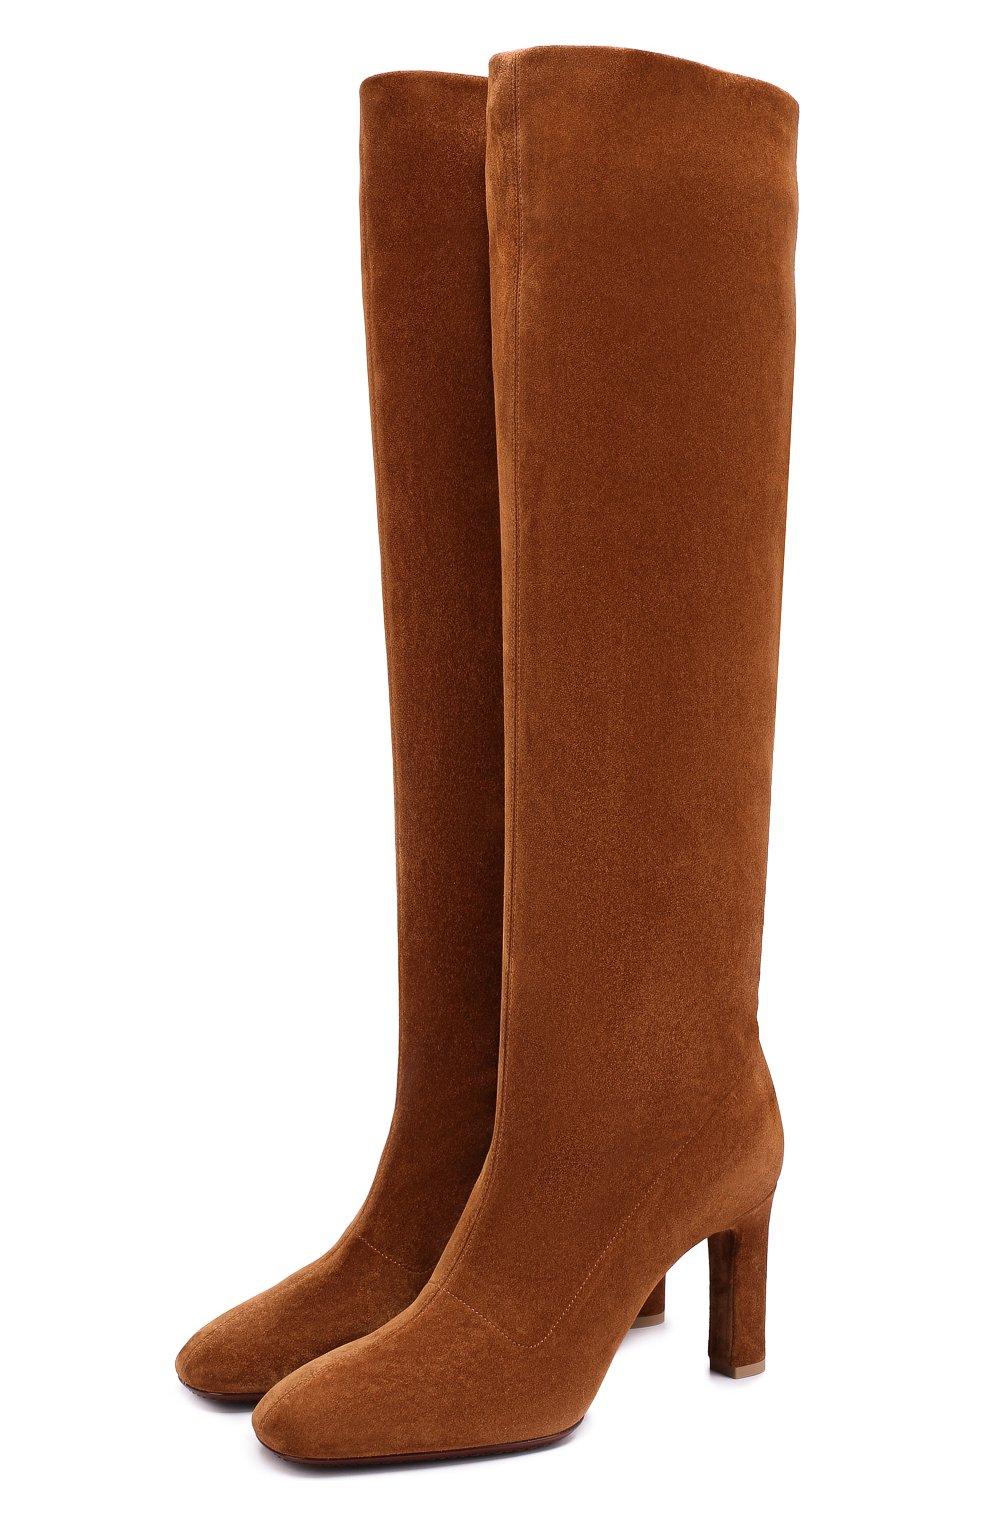 Женские светло-коричневые замшевые сапоги на устойчивом каблуке ... e55ece62ed7